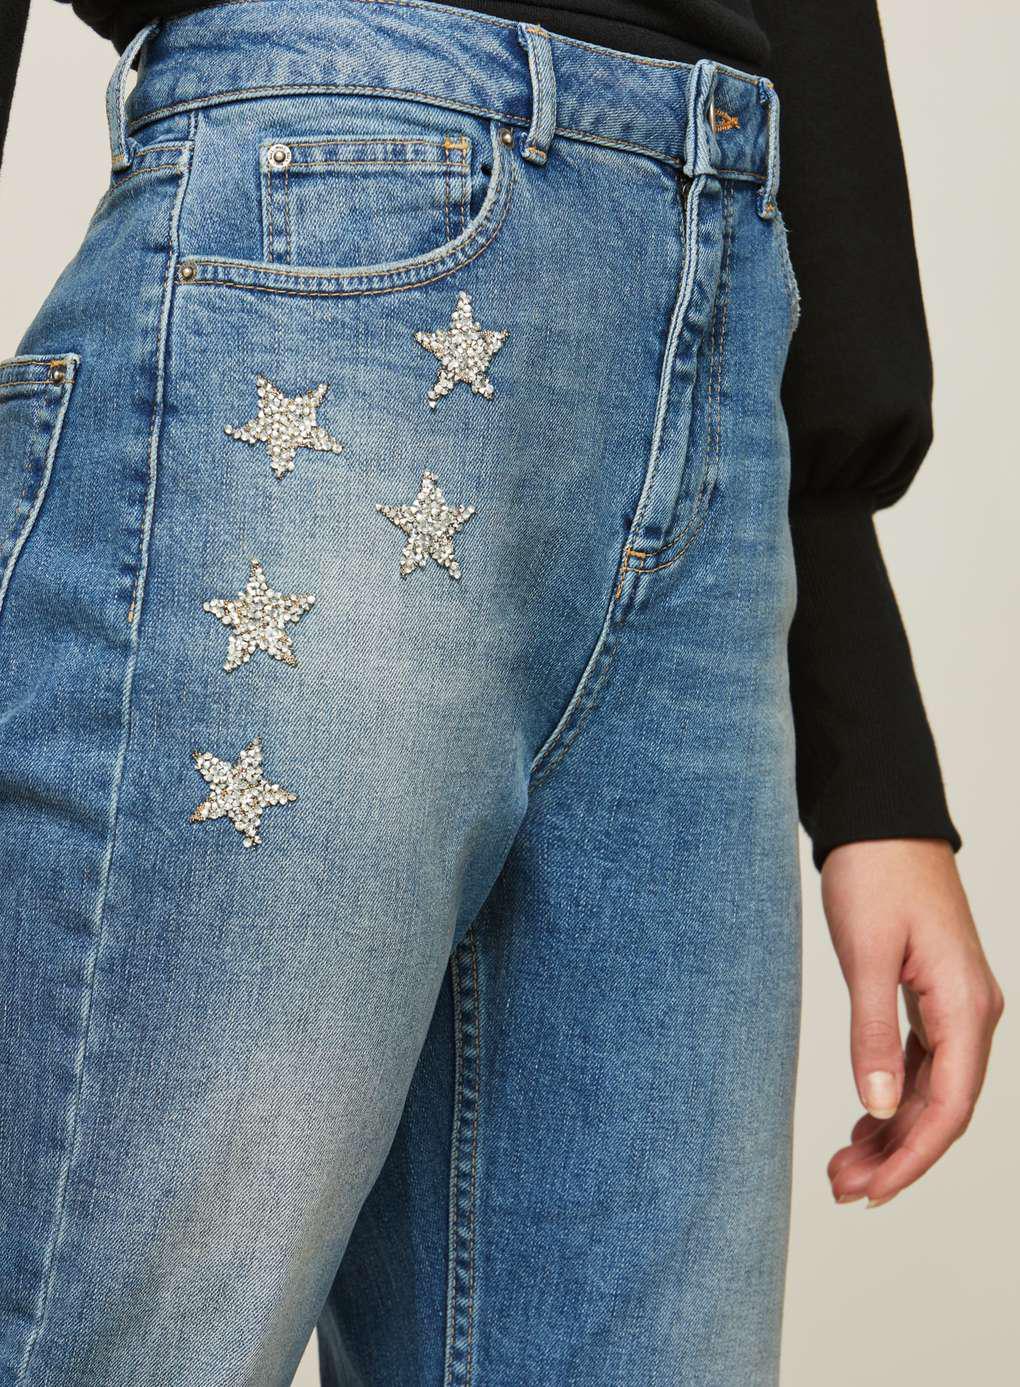 538df969561c0a Lyst - Miss Selfridge Silver Star Mom Jean in Blue